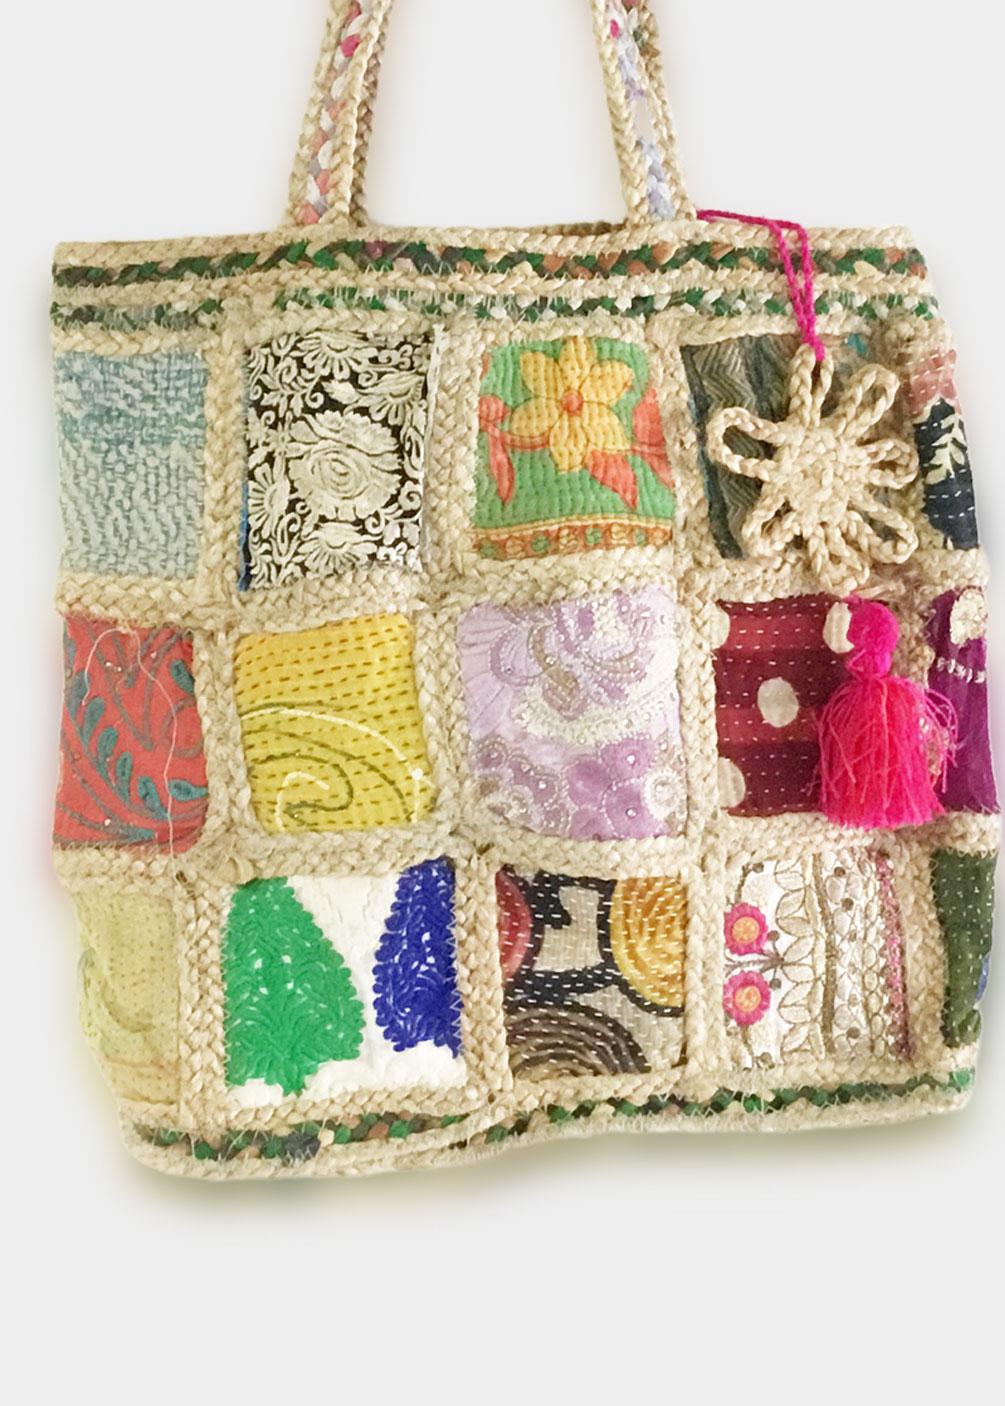 bolso patchwork shopper grande yute comodo bonito colores interior forrado bolsillos